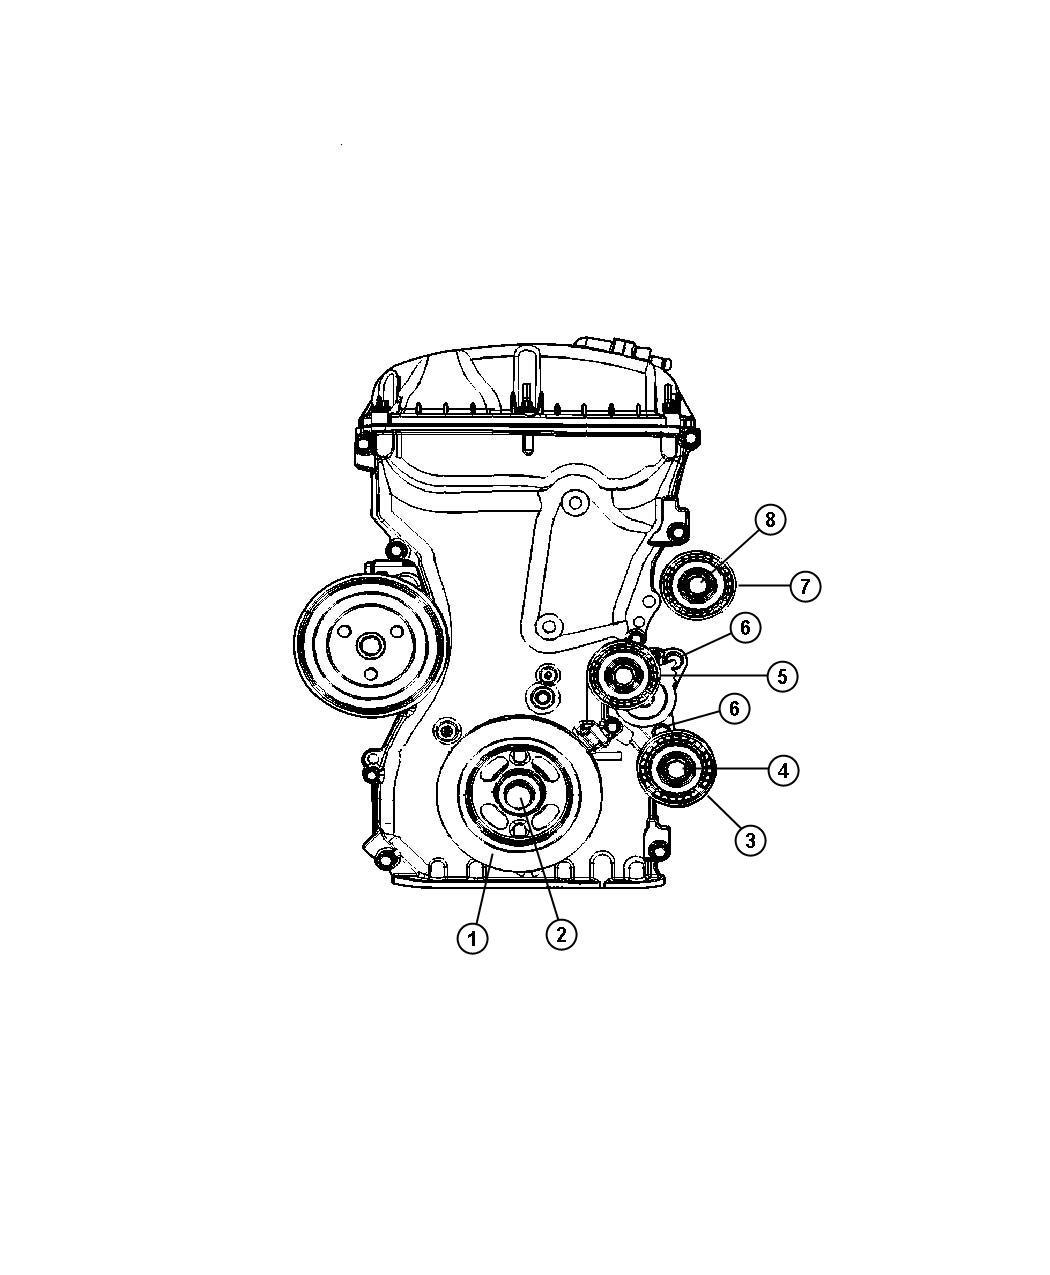 Jeep Patriot Pulley. Idler. Upper. Module, power, train